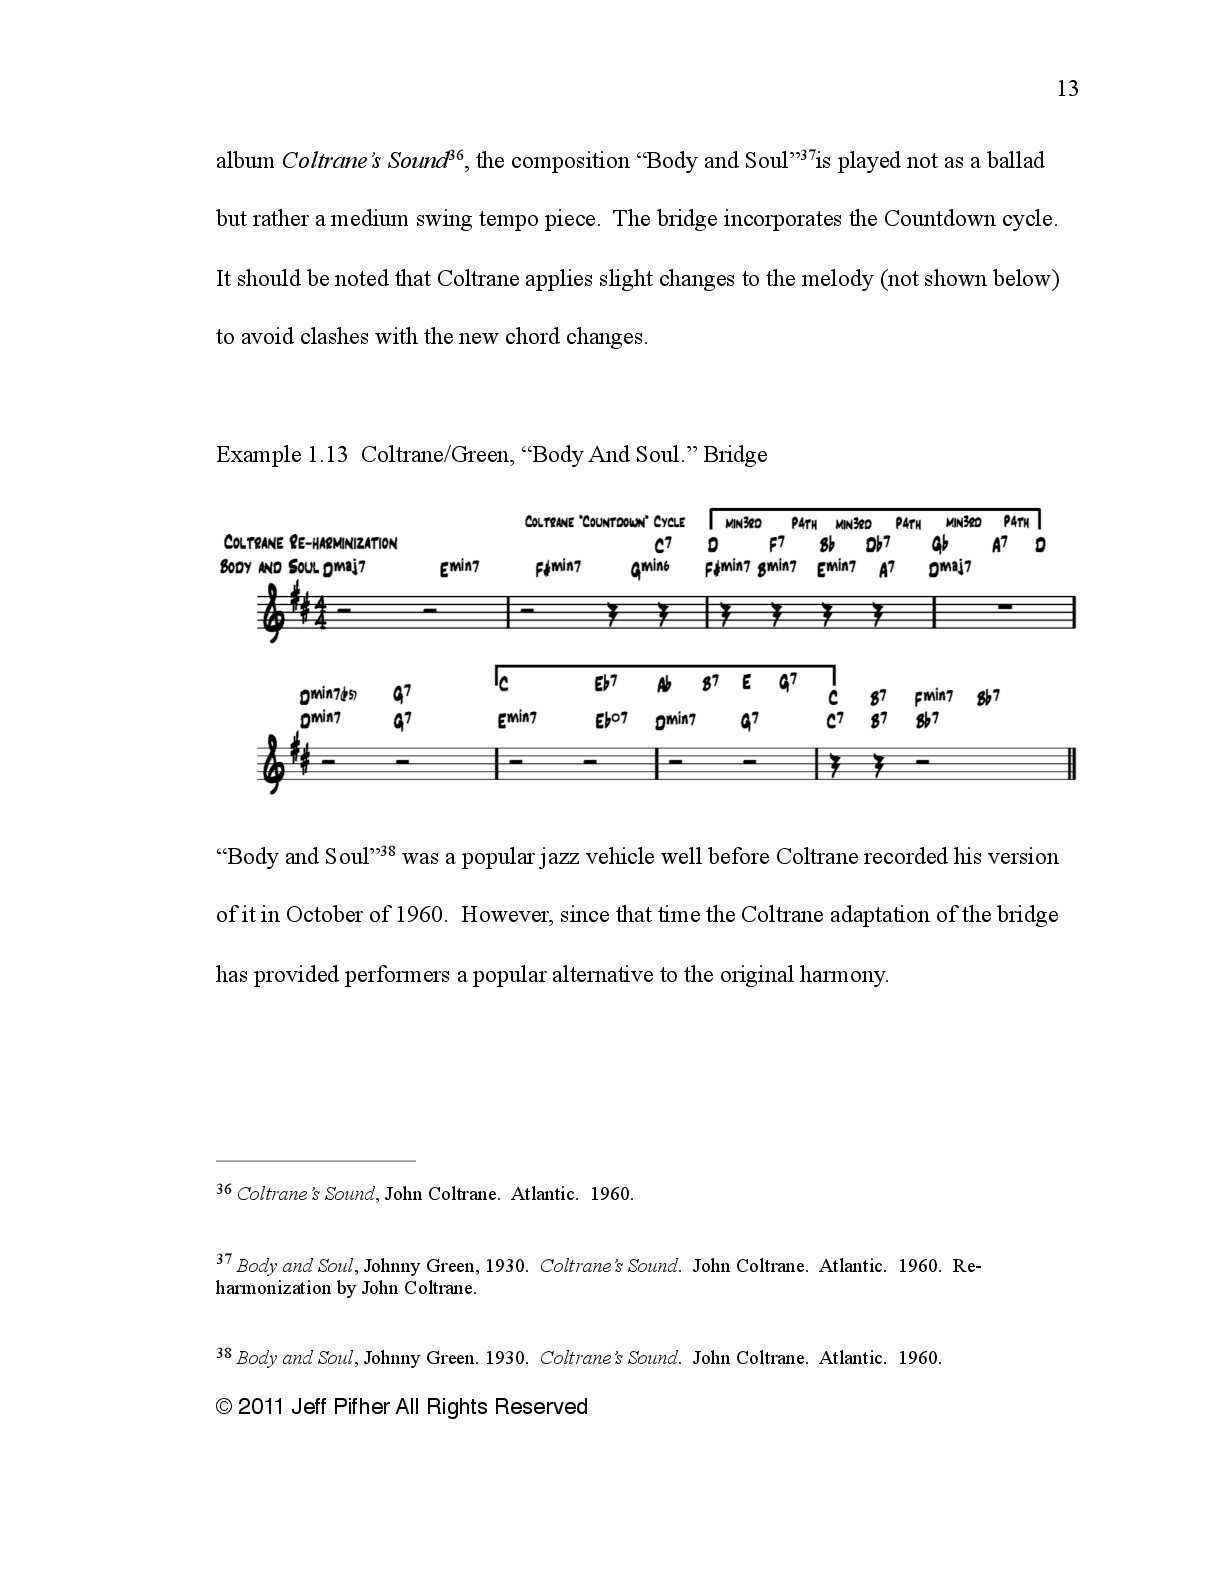 Jeff-Pifher-Academic-Series-Coltrane-Cycles-013.jpg